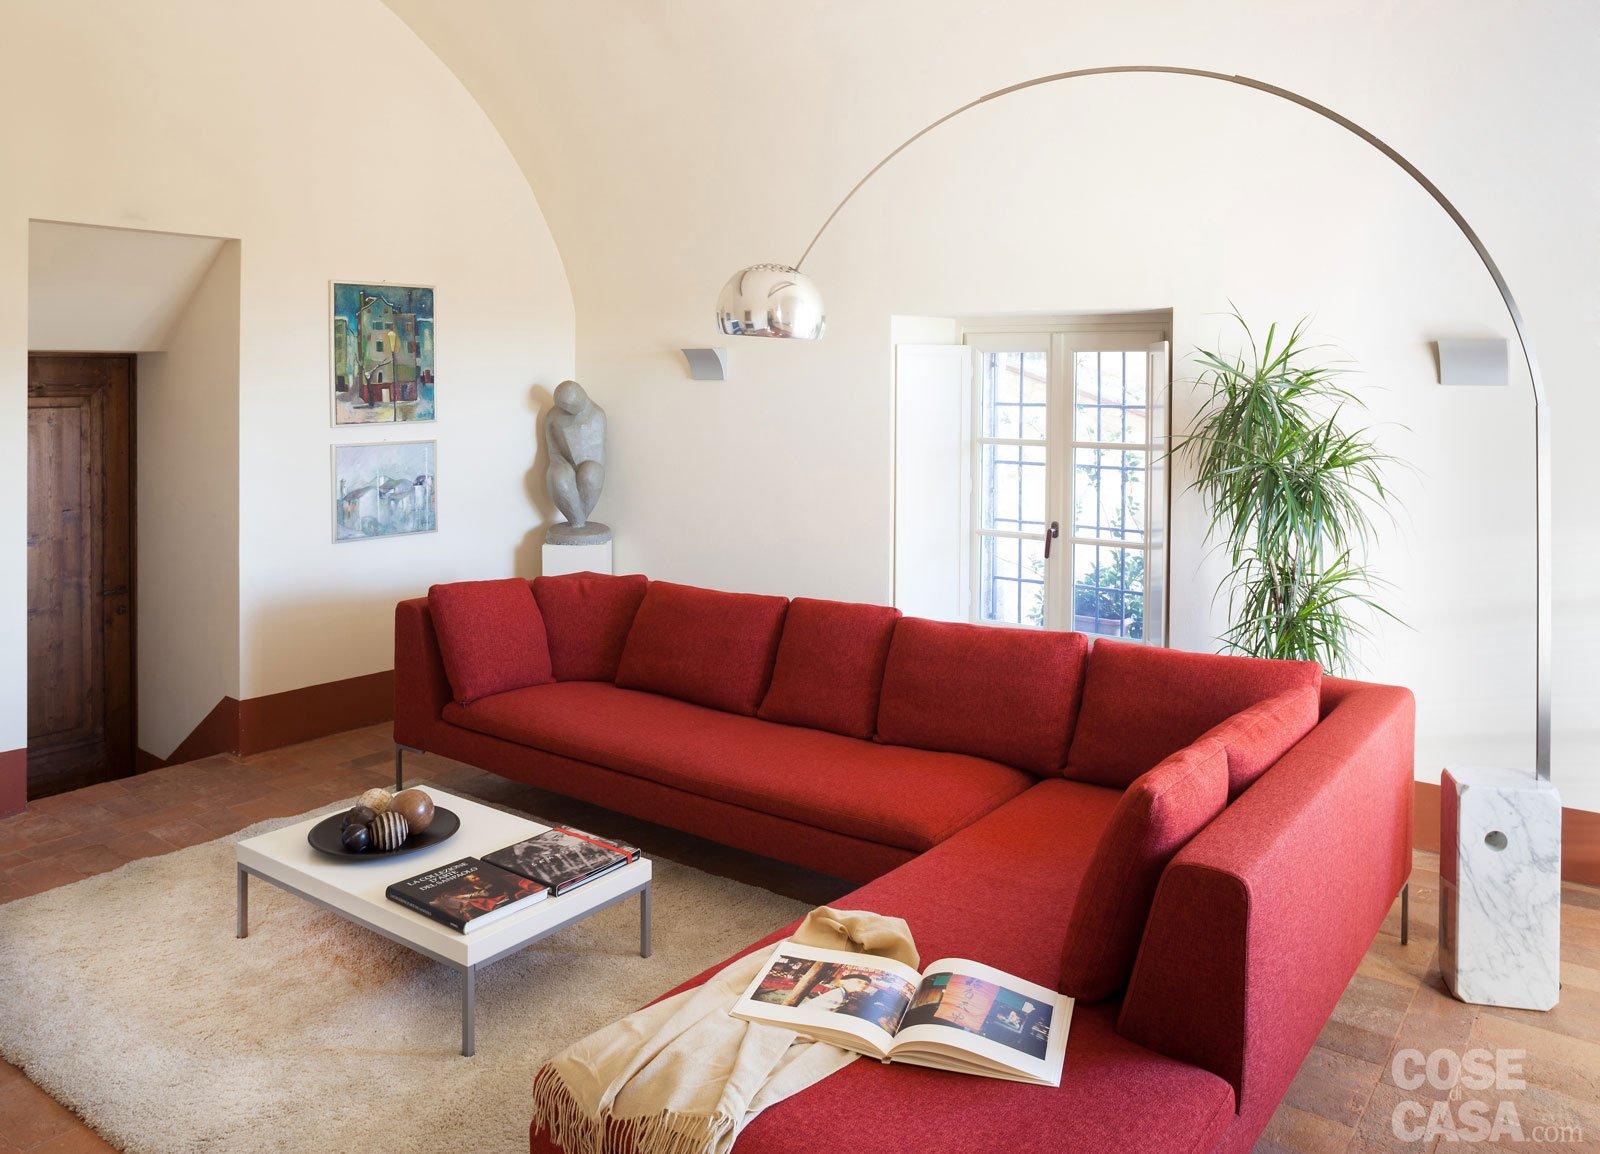 Salotto rustico moderno gg18 regardsdefemmes for Salotto casa moderna